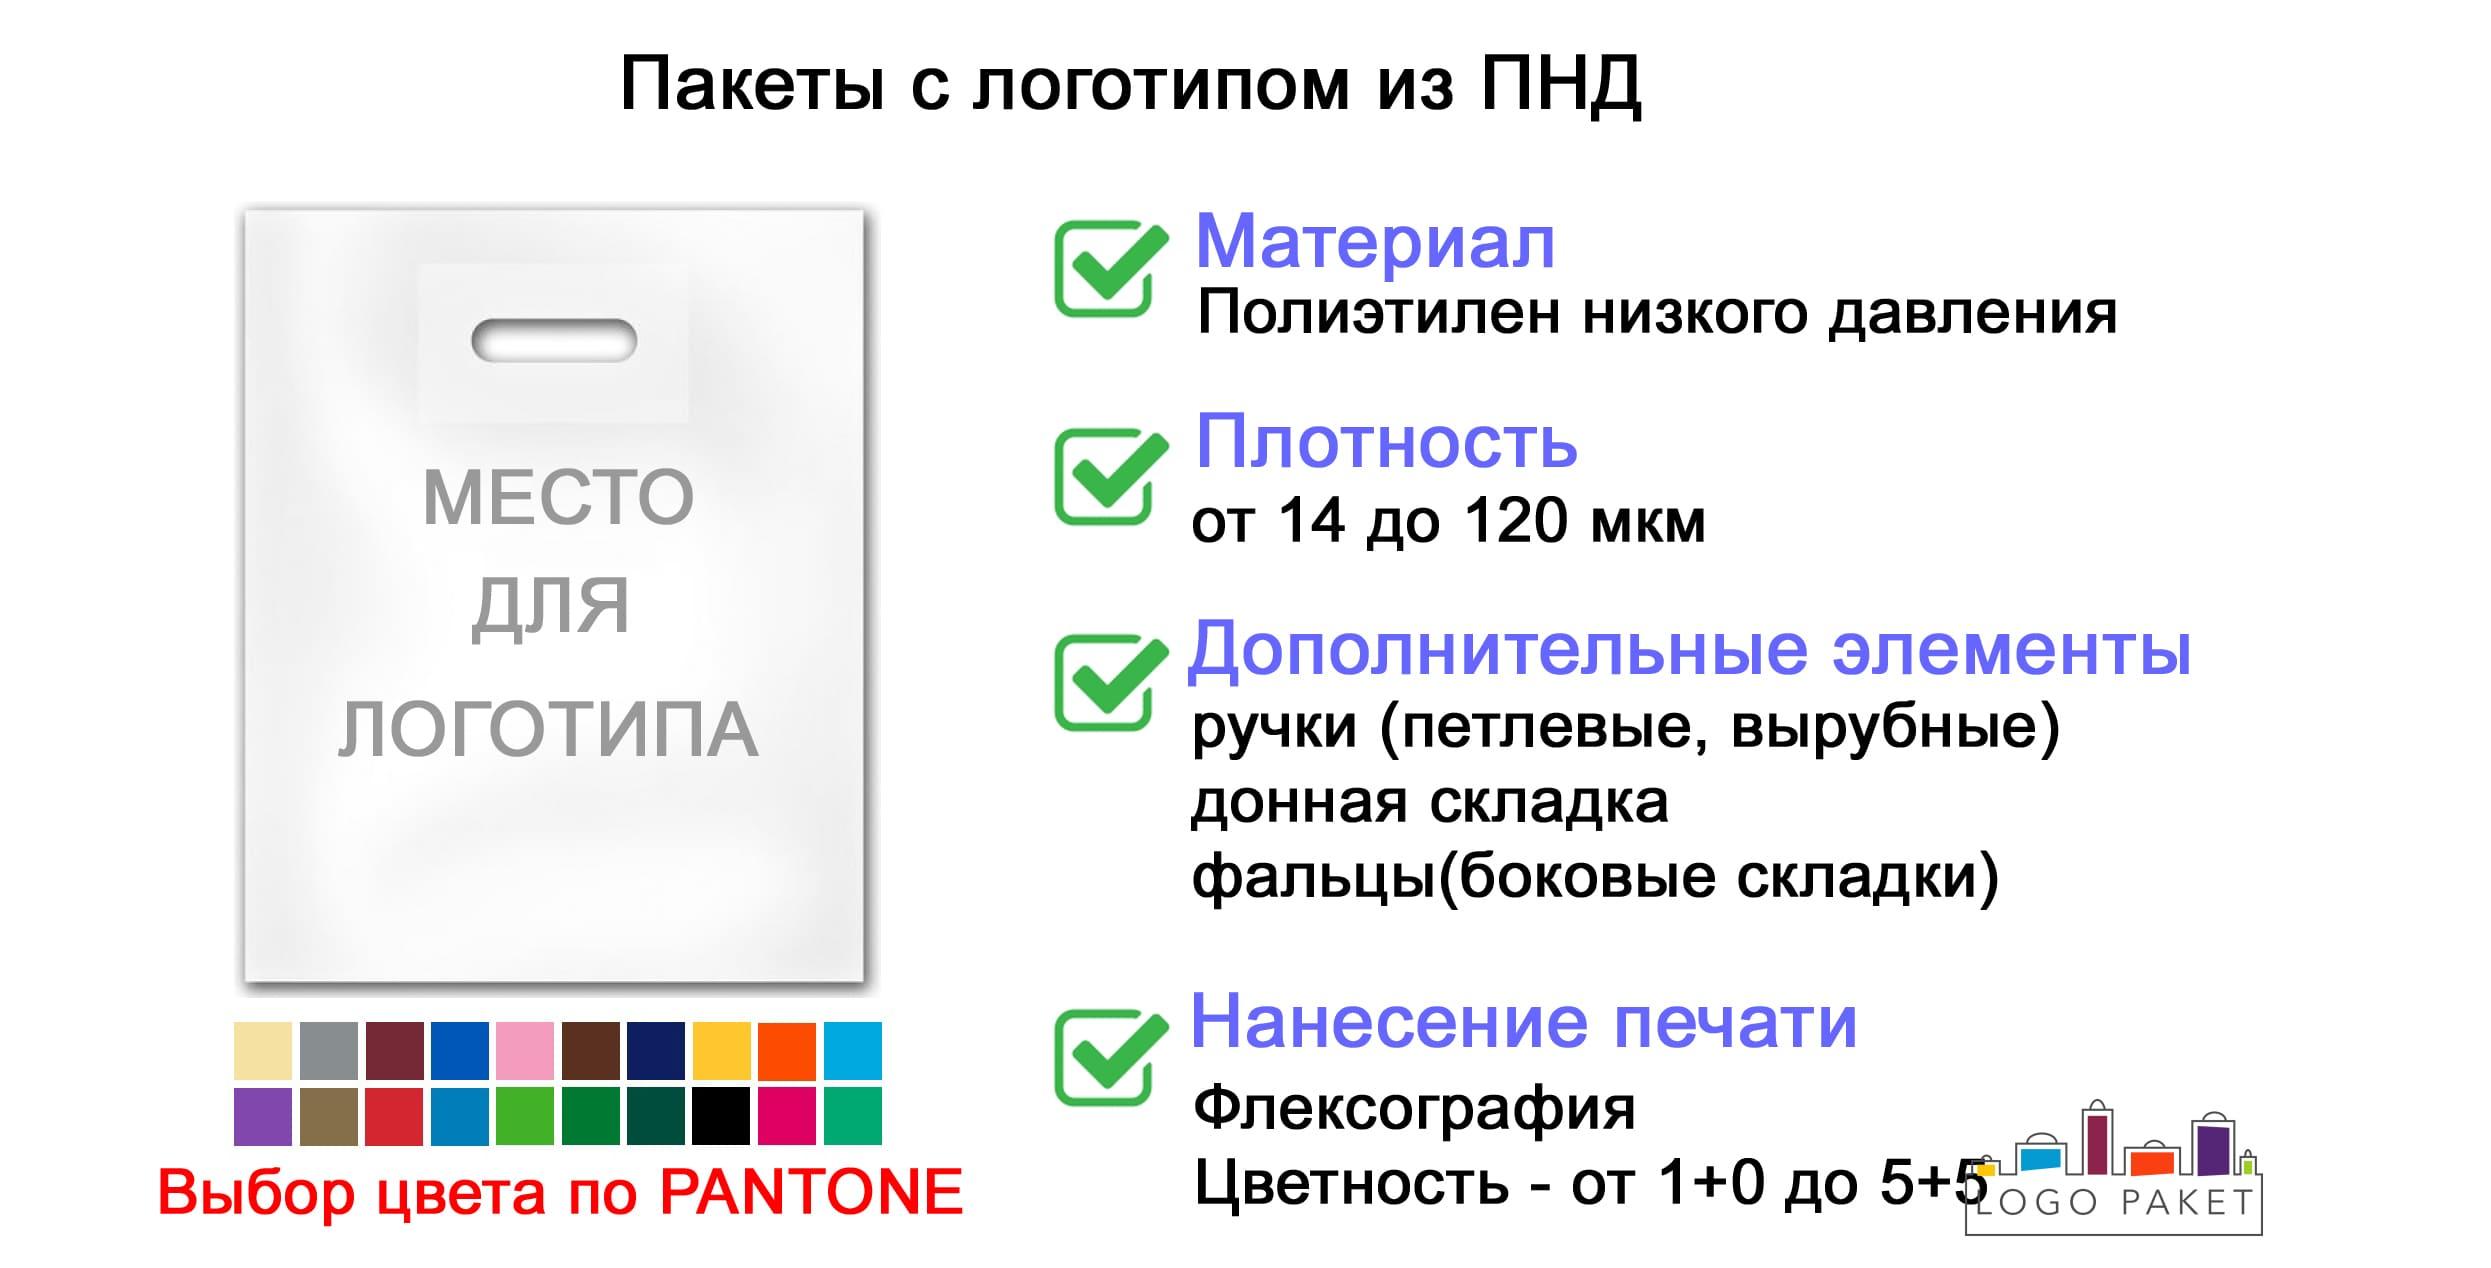 Пакеты ПНД с логотипом инфографика